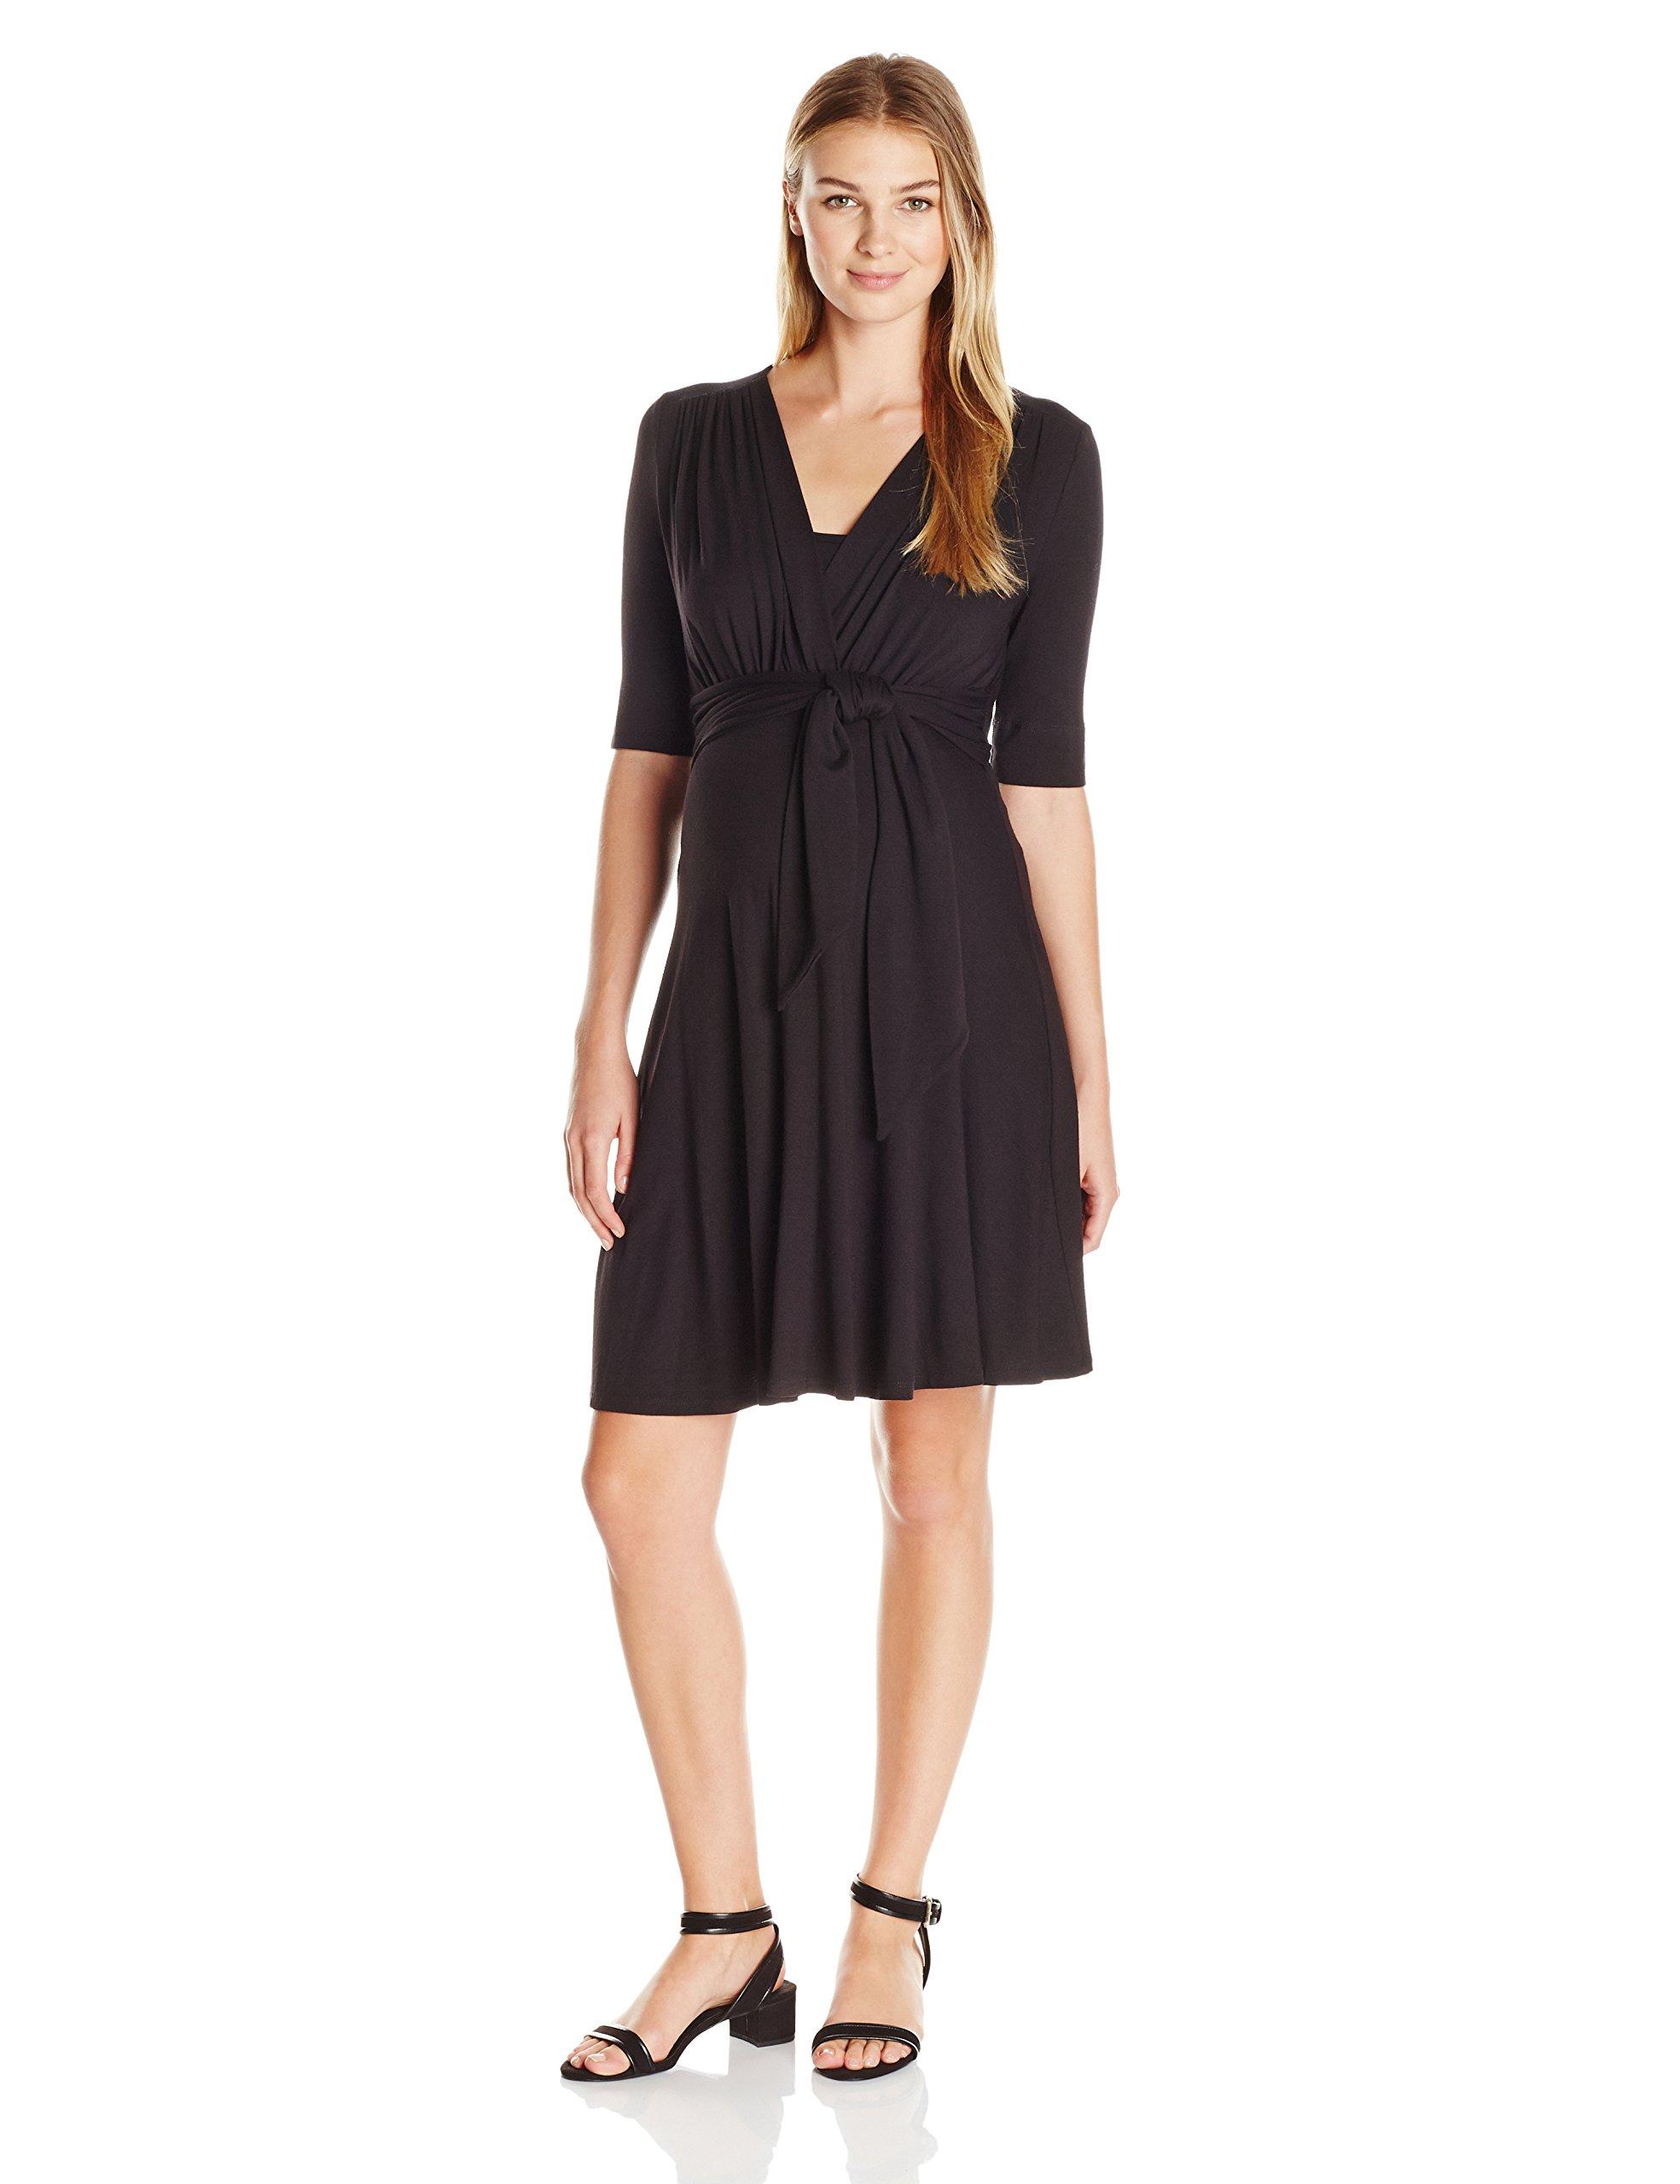 Maternal America Women's Maternity Mini Front Tie Nursing Dress, Black, M by Maternal America